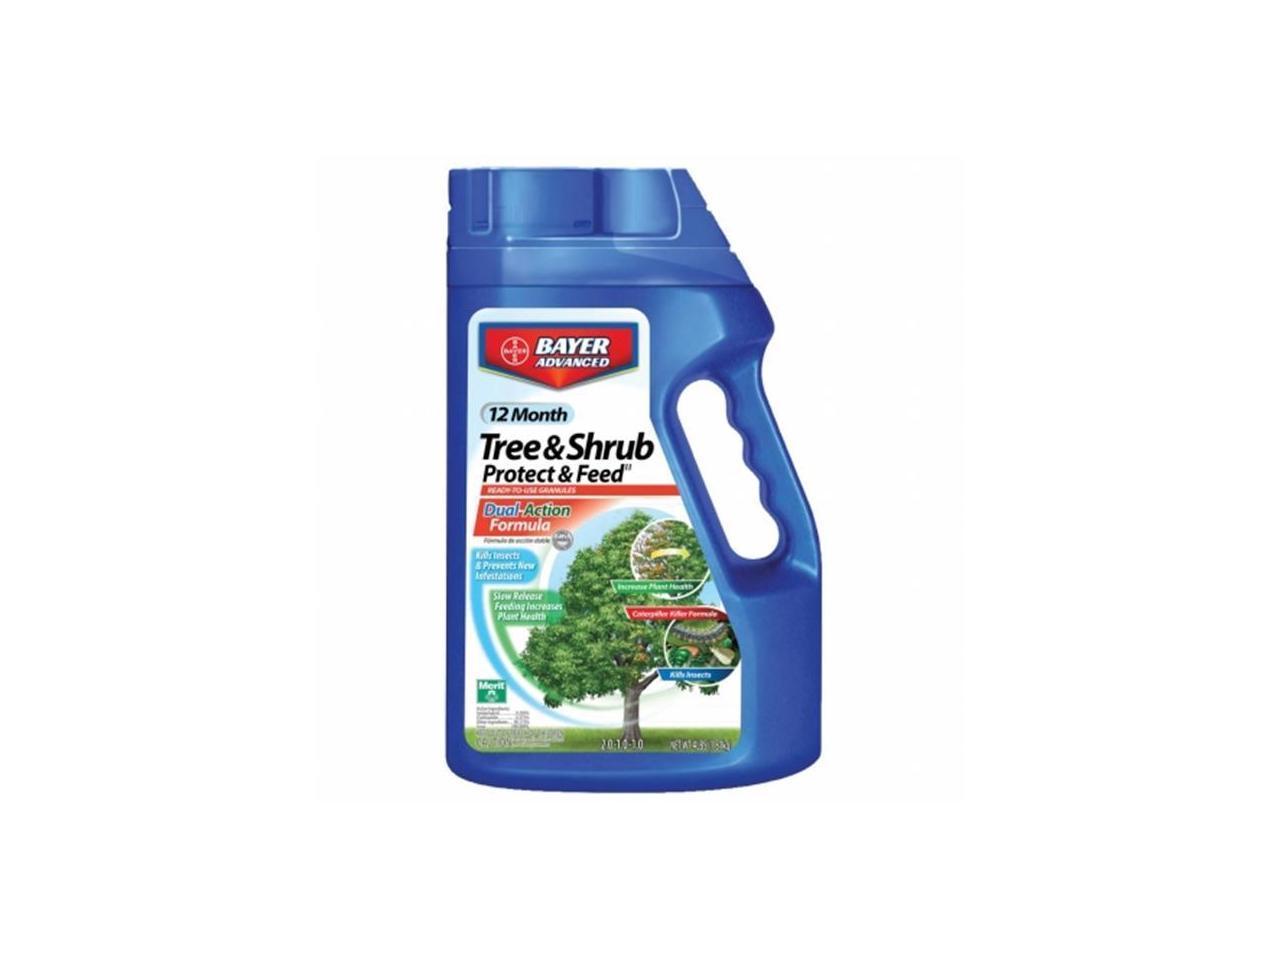 Bayer Bay701700b Bayer 4 No 12 Month Tree And Shrub Protect And Feed Gran Newegg Com